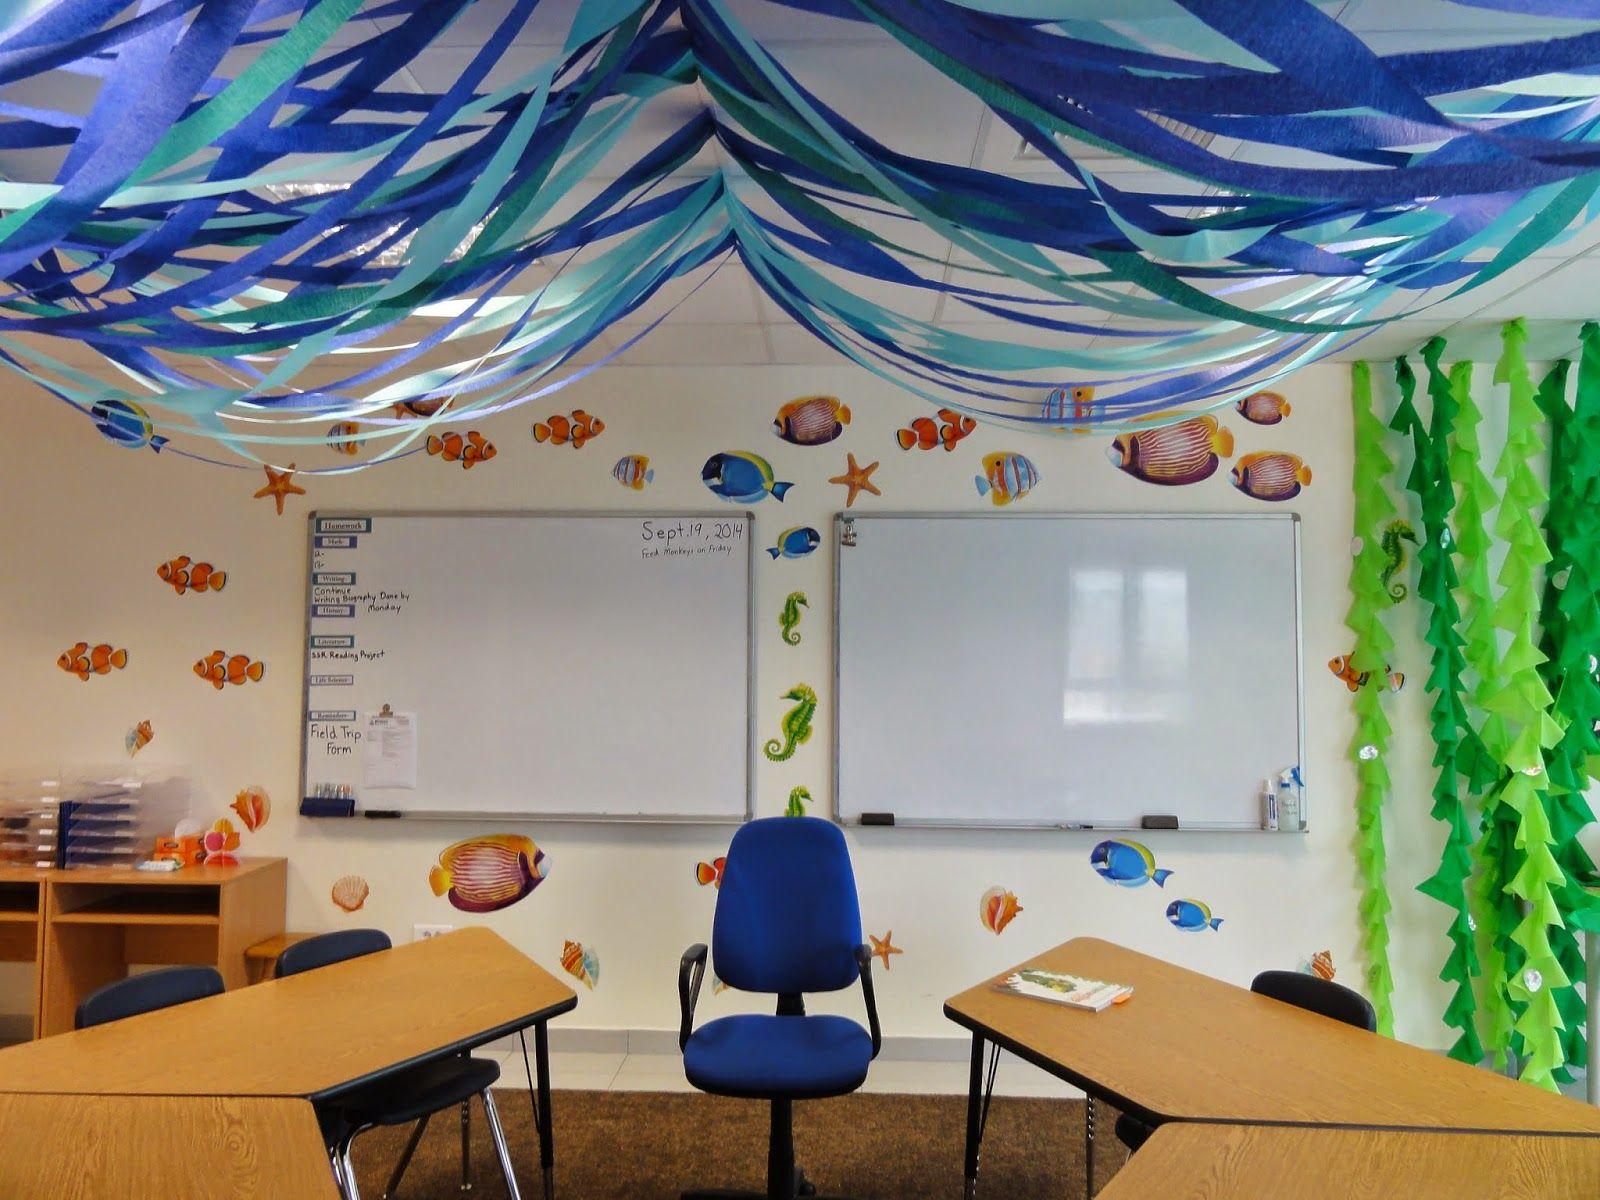 Ocean Classroom Theme With Images Ocean Classroom Ocean Theme